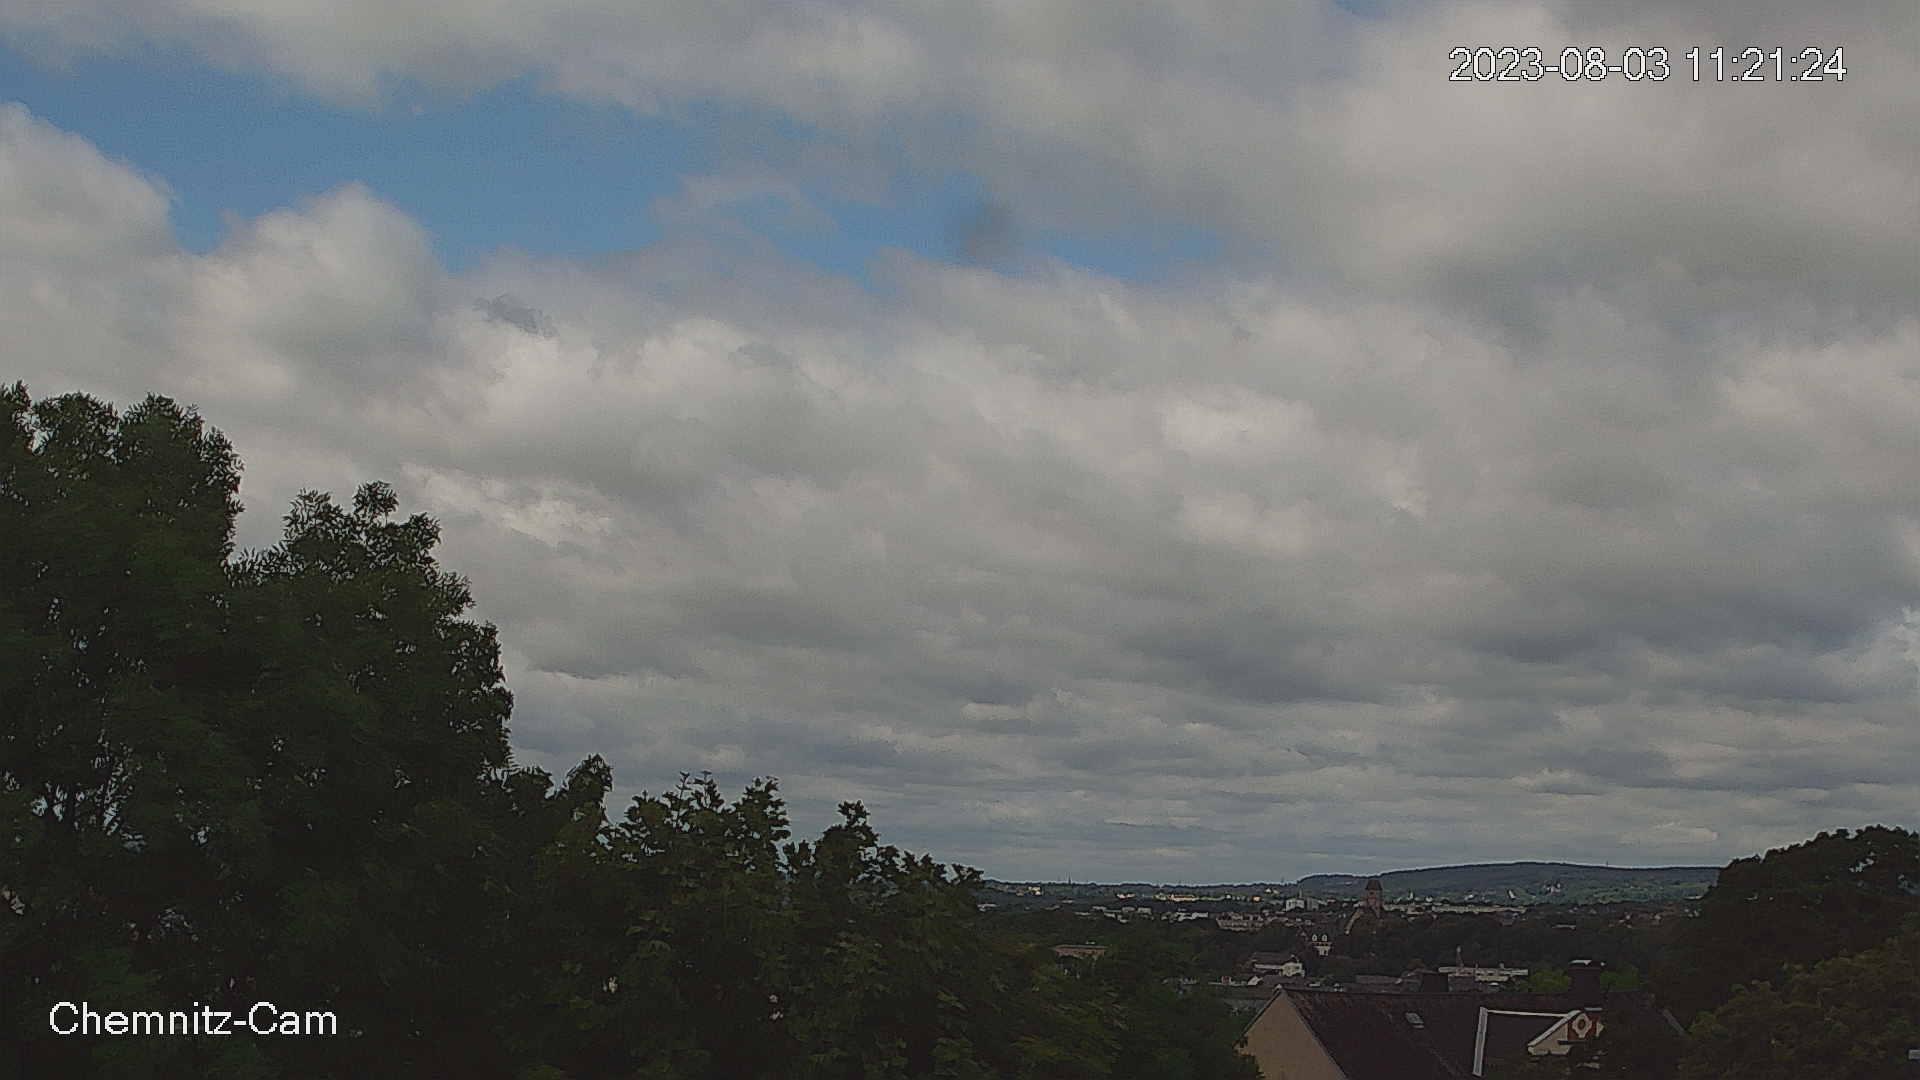 Wetter Webcam Bild Chemnitz rechts